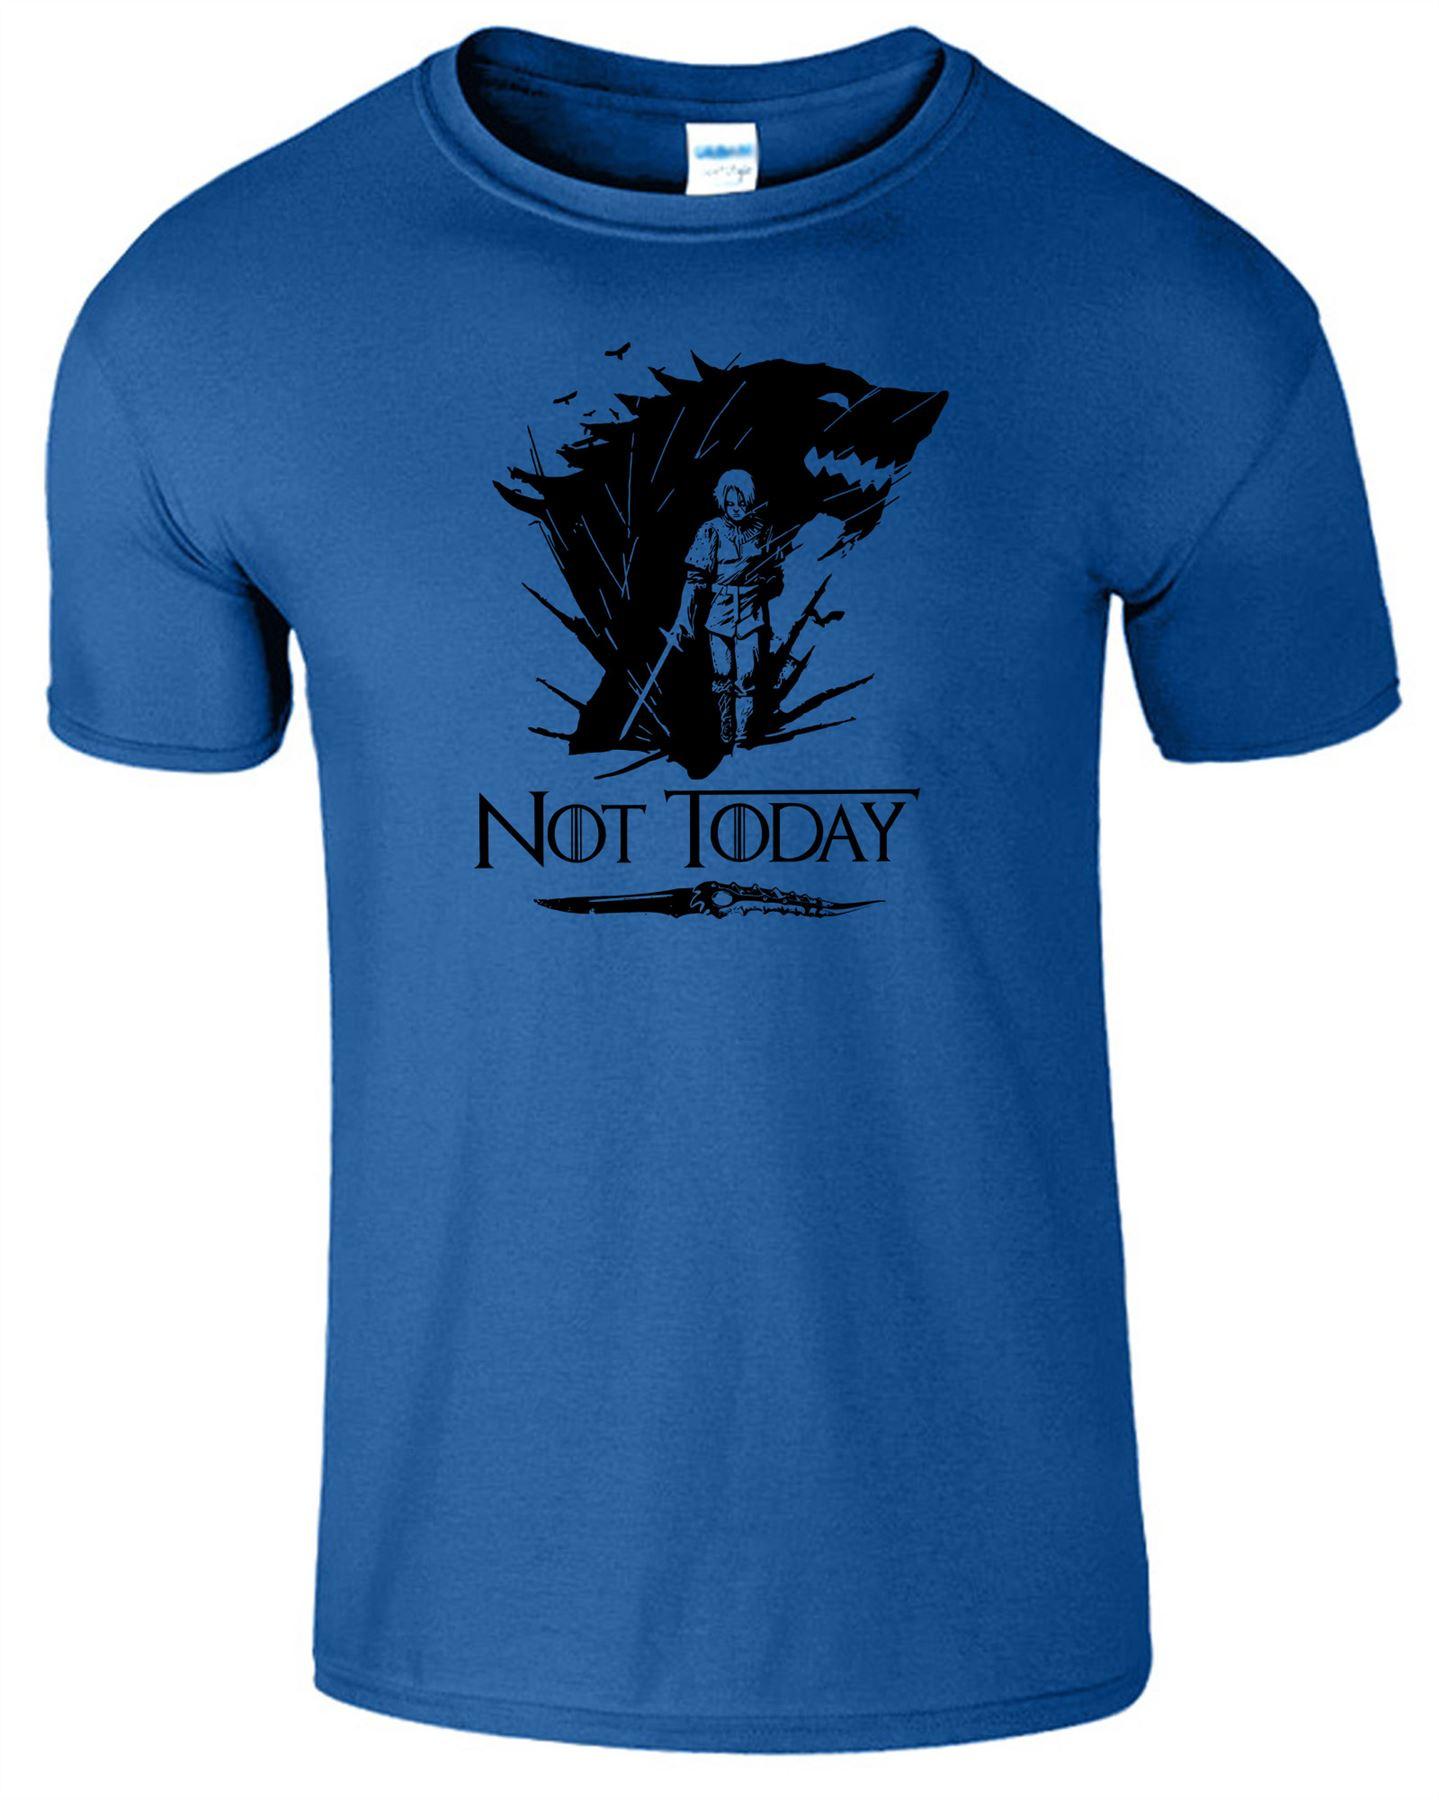 Arya-Stark-Not-Today-T-Shirt-Mens-Game-Season-Womens-Shirt-Adults-Unisex-Fit Indexbild 40